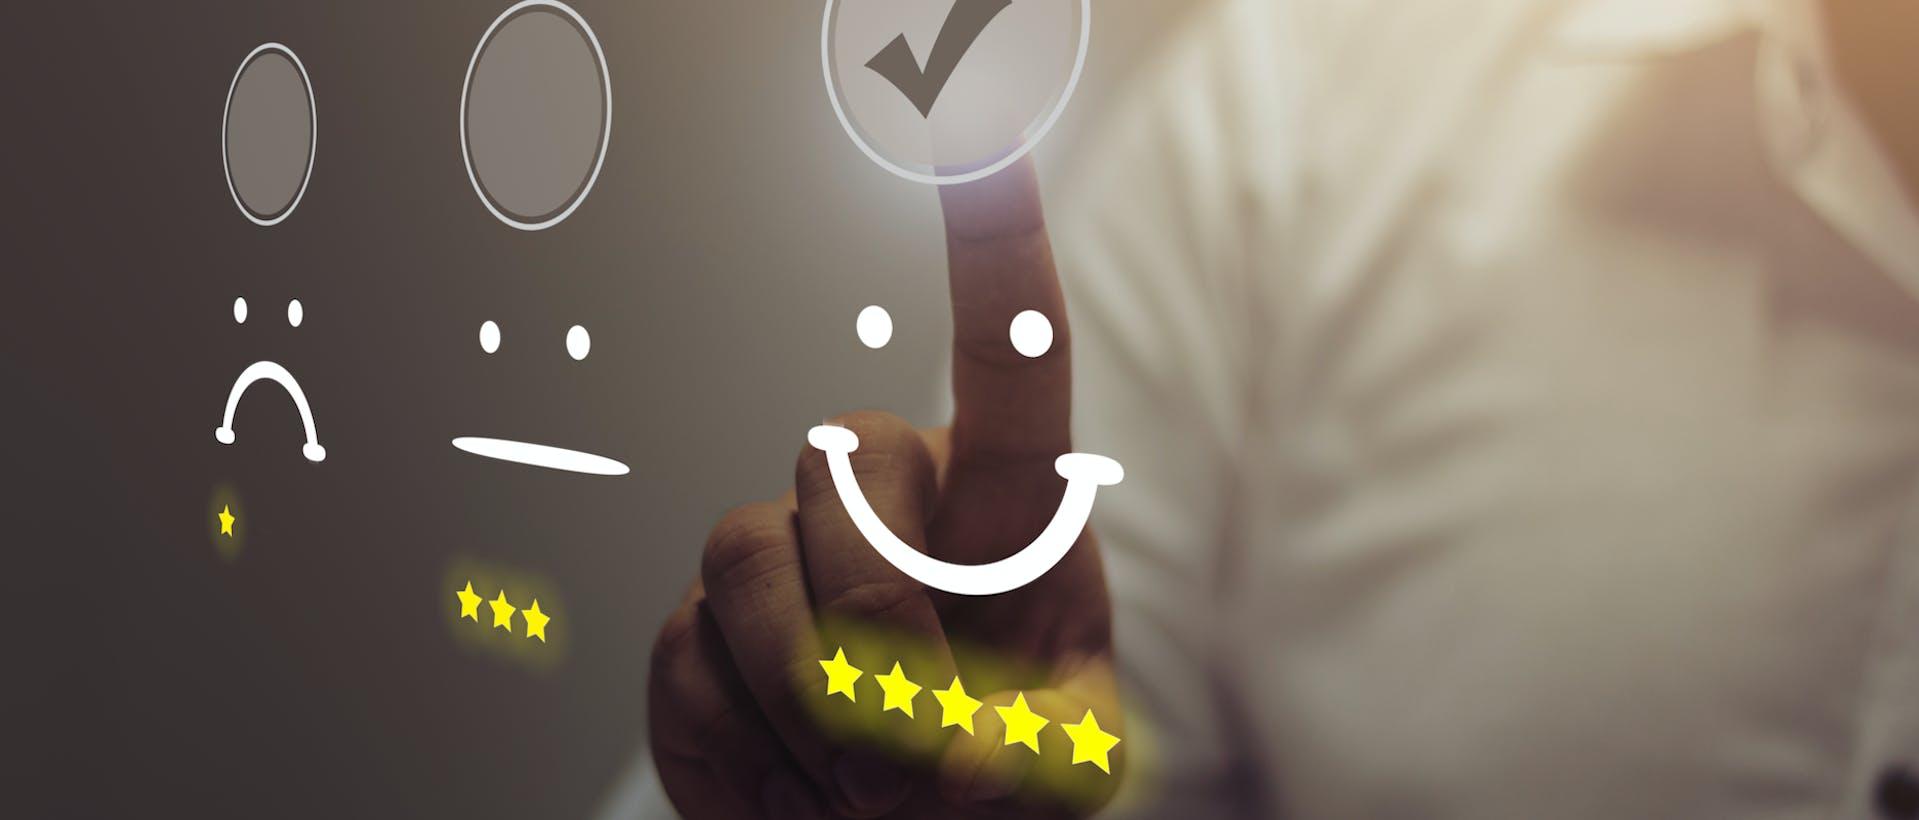 reputation management five star customer score